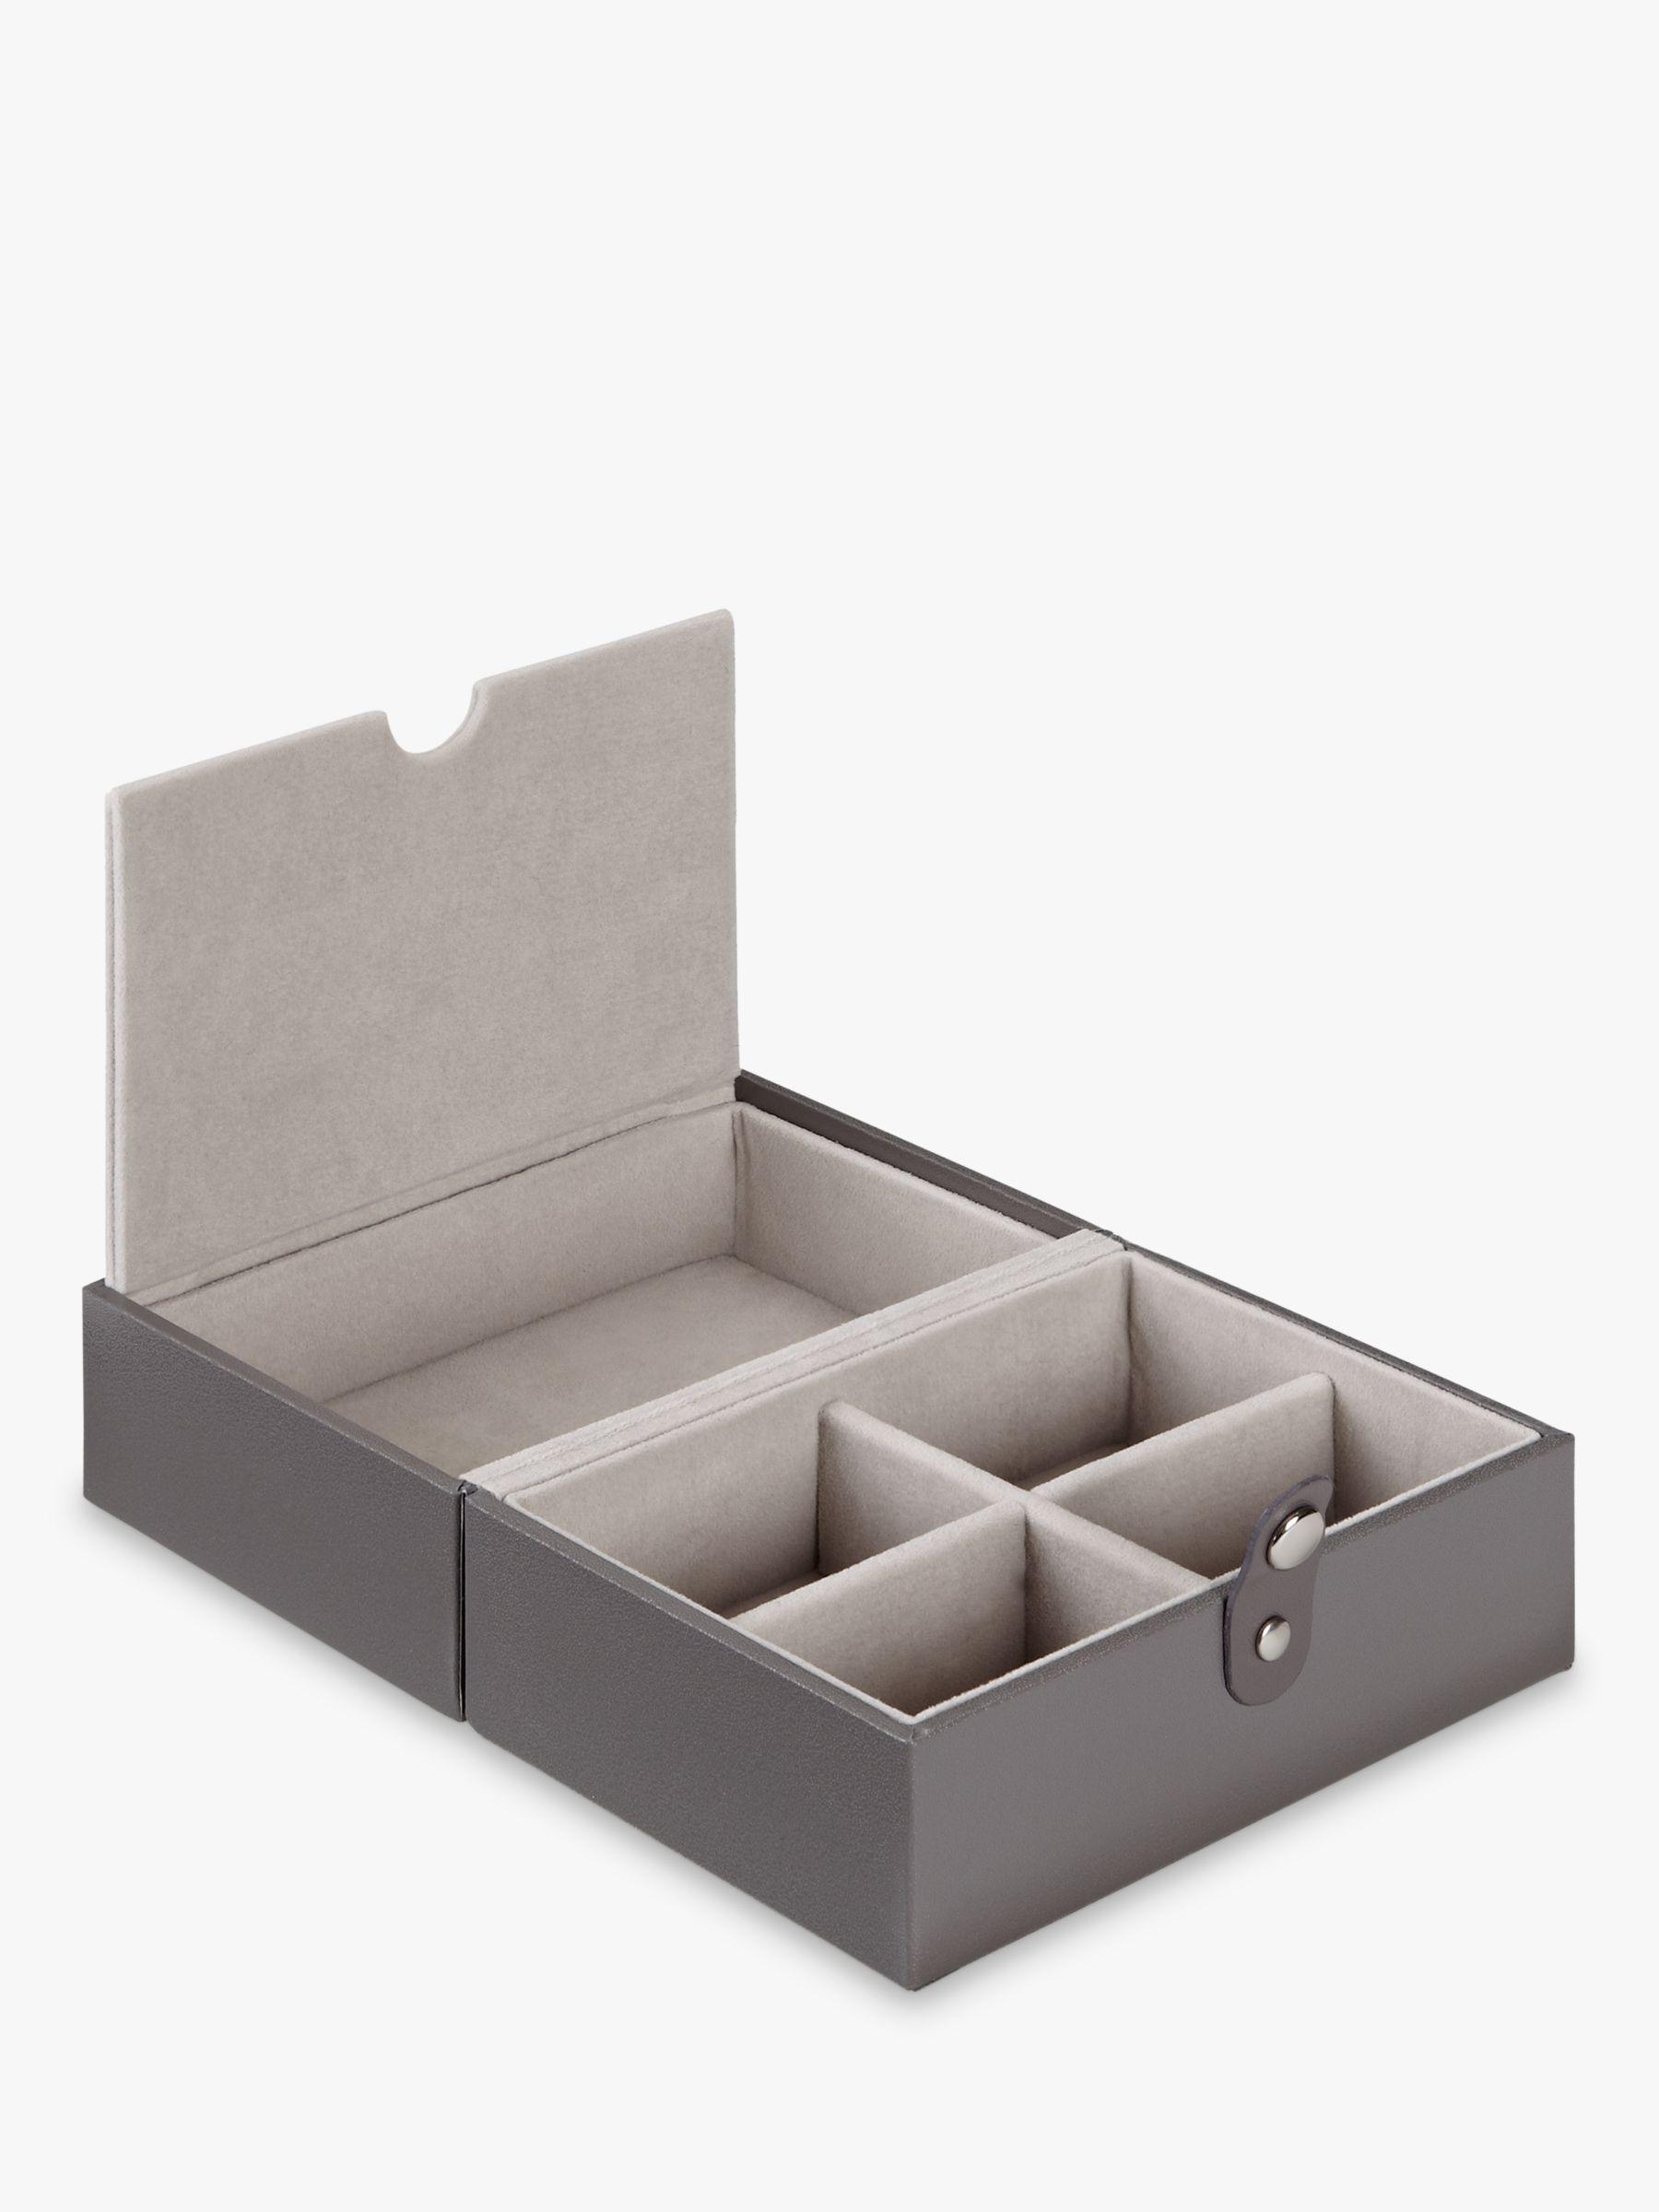 LC Designs LC Designs Travel Jewellery Box Tray, Mink/ Grey Velvet